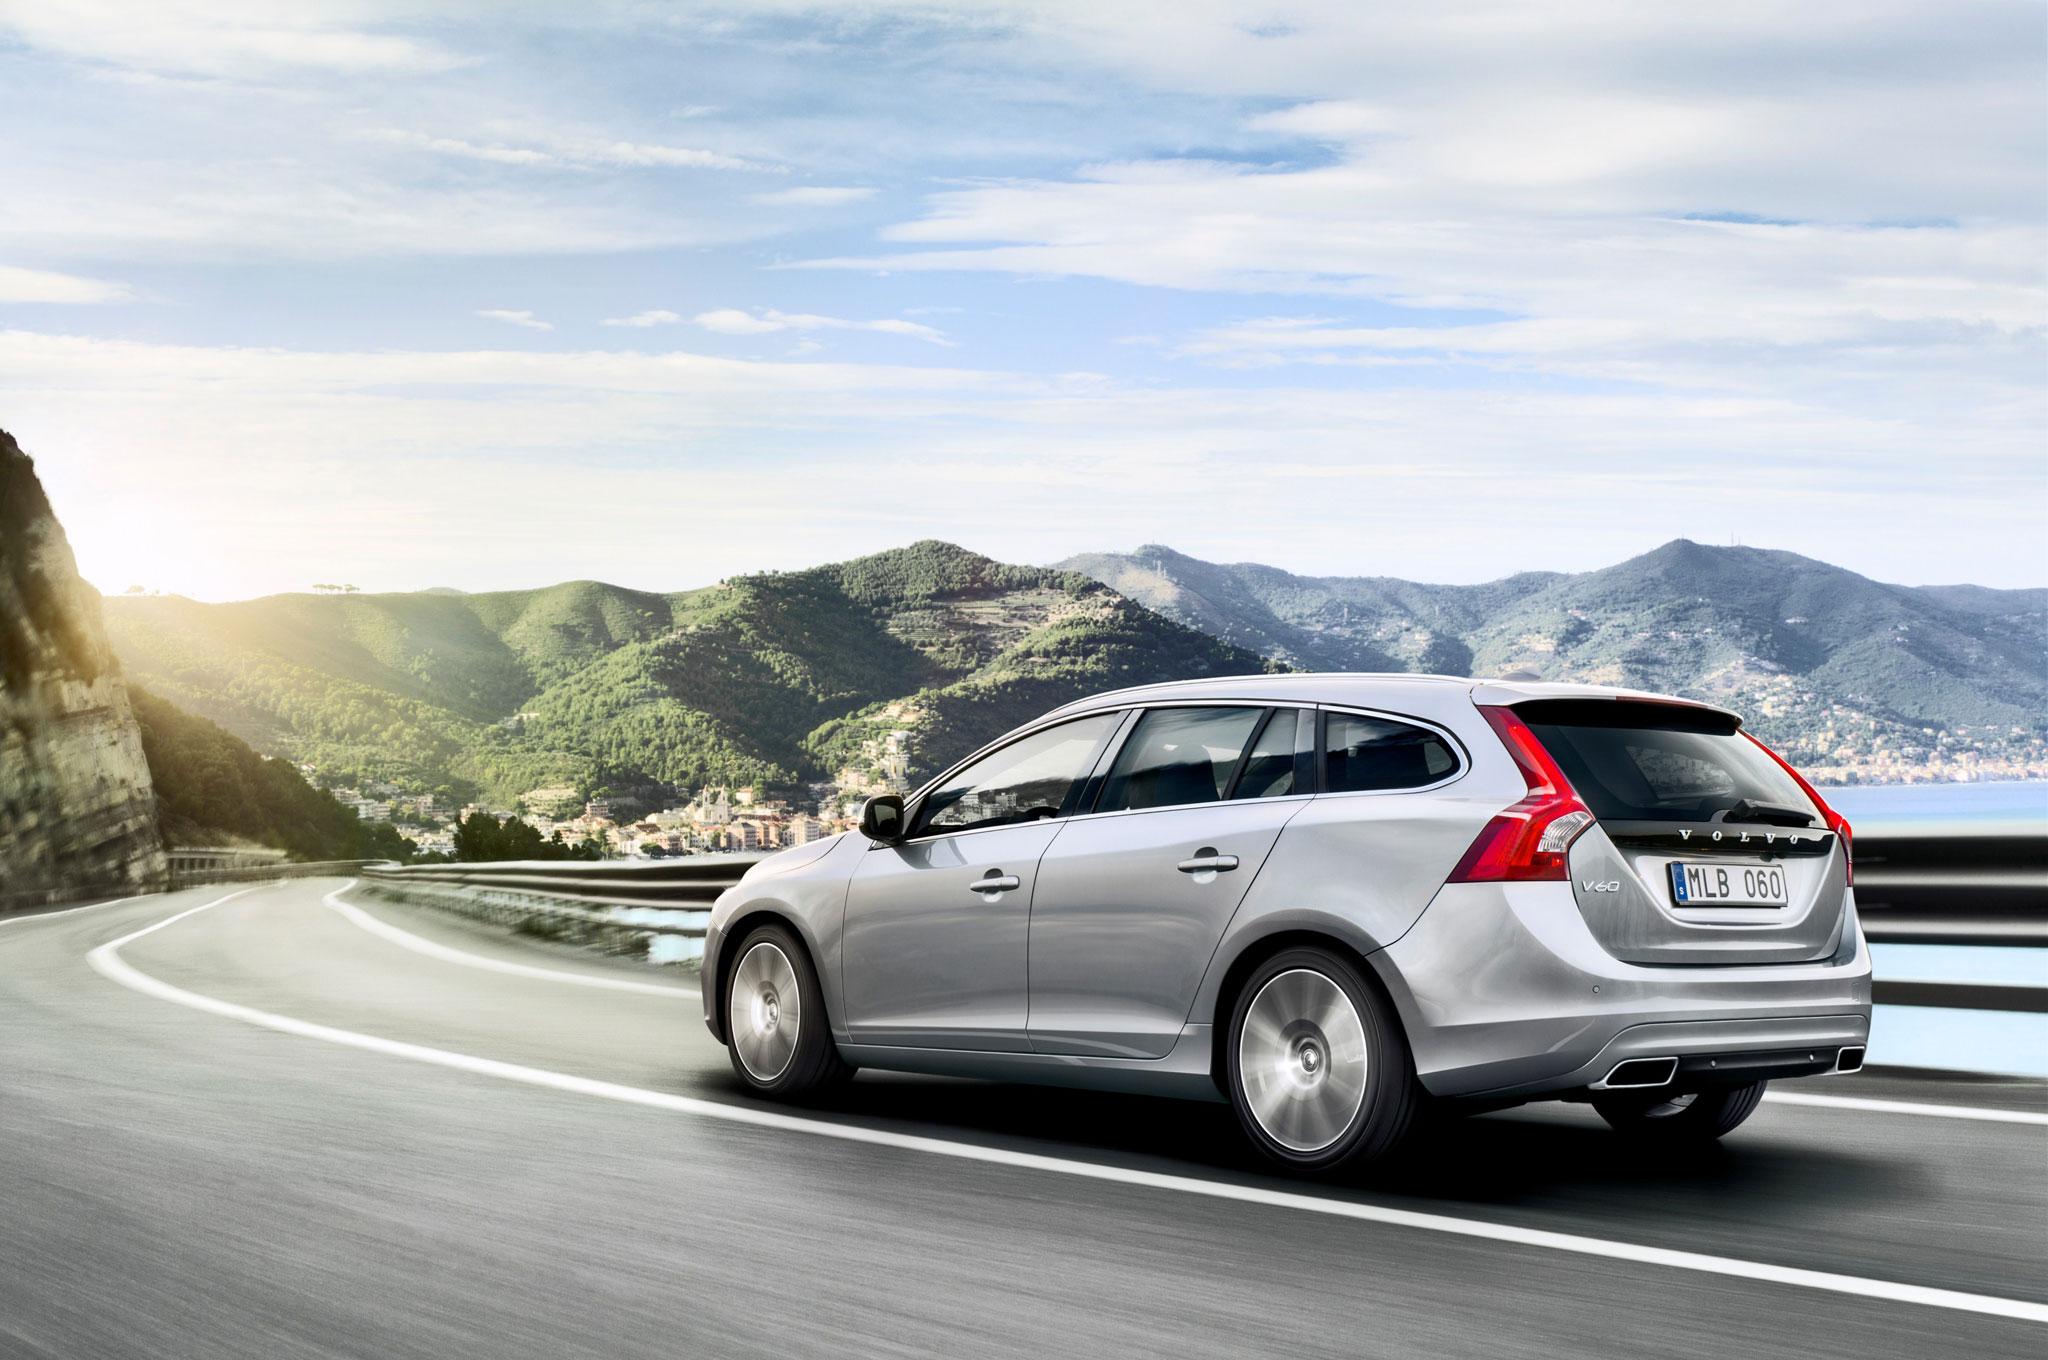 2015 Volvo V60 Rear Left Side View1